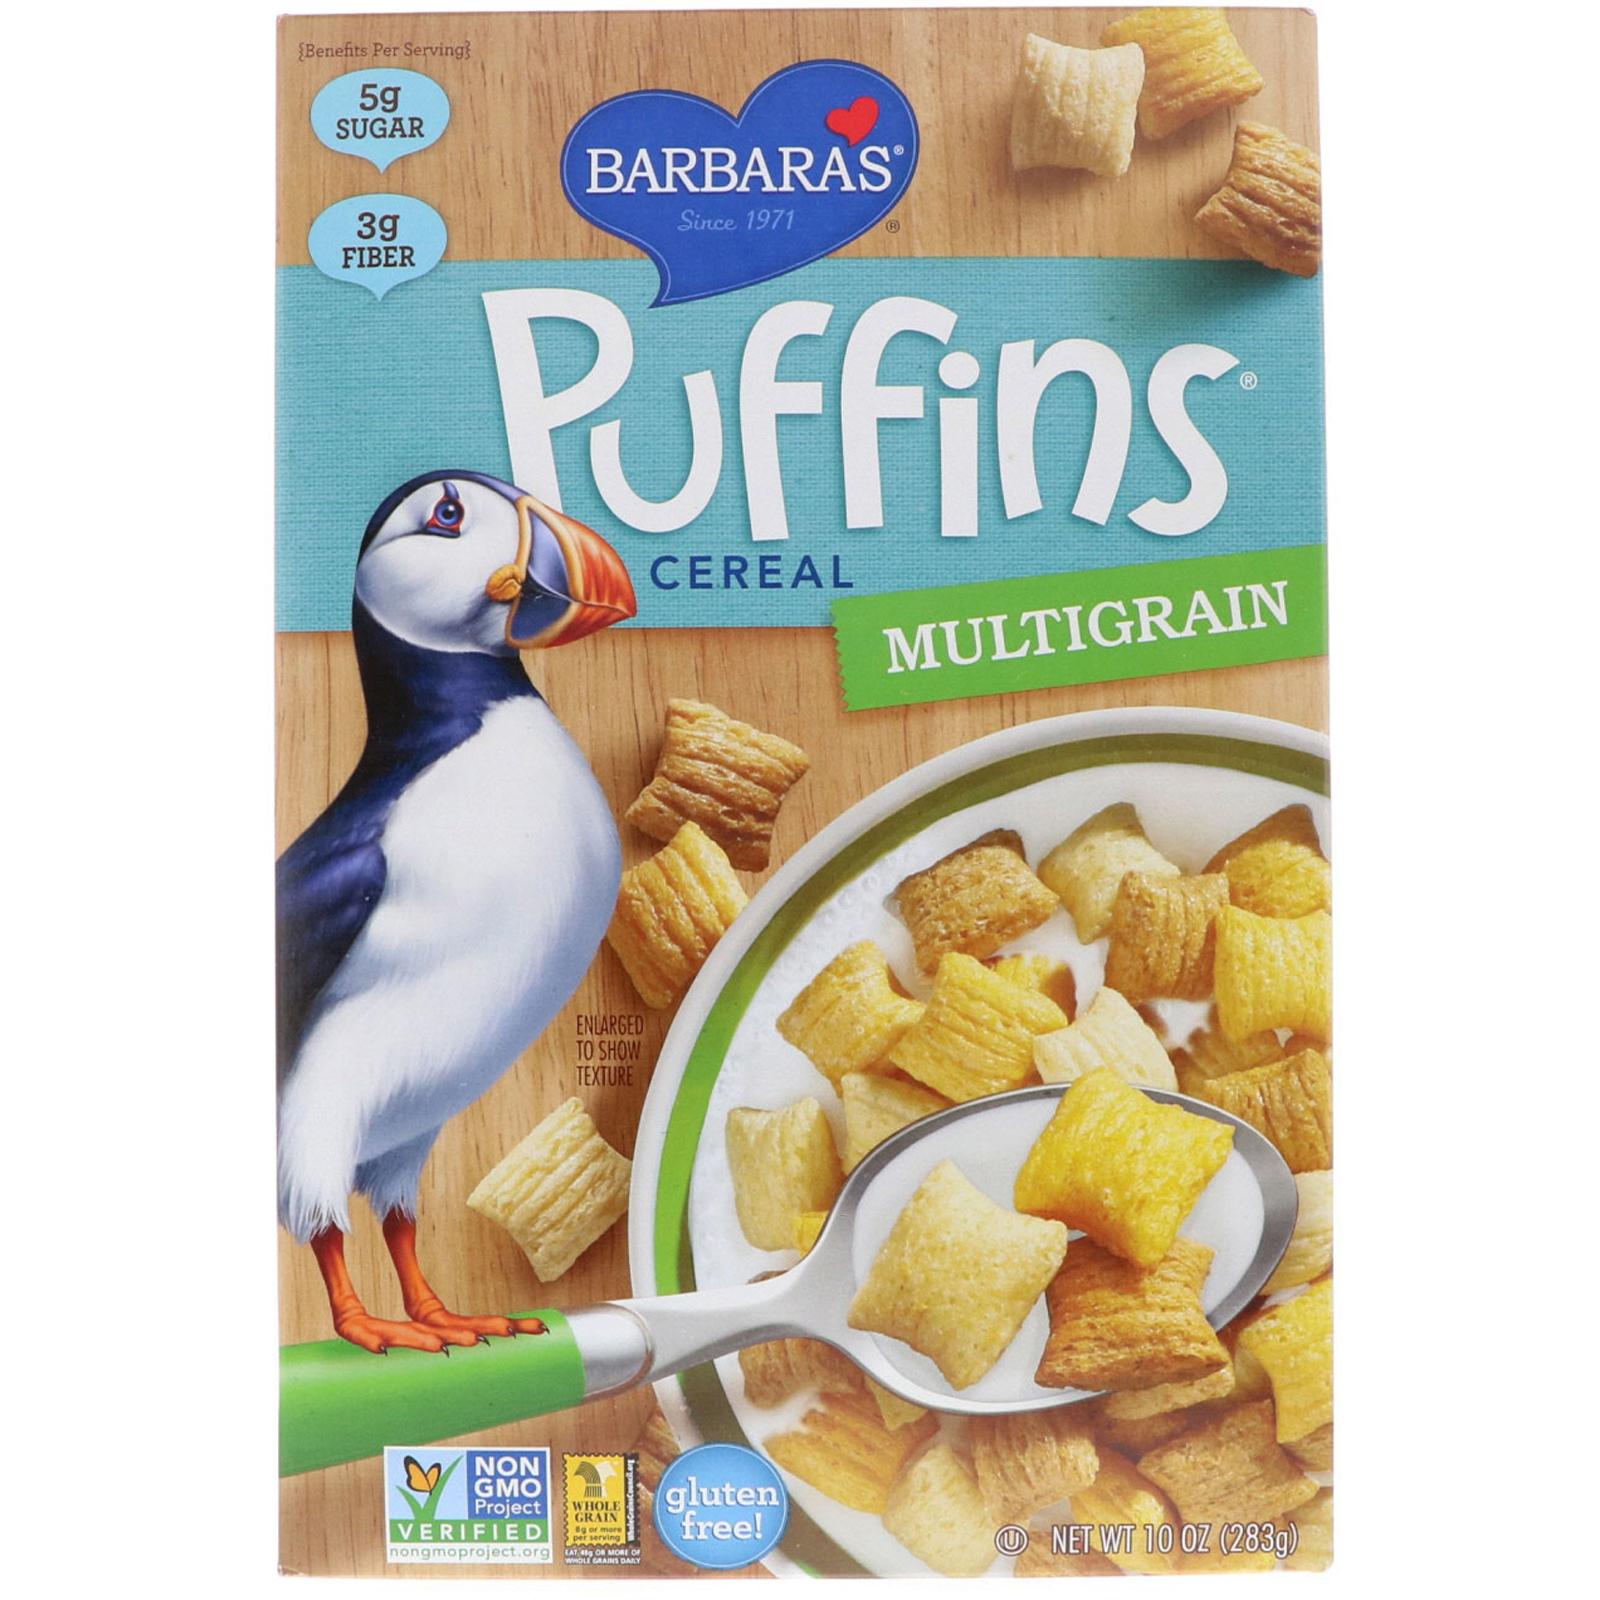 Barbara's Bakery, Puffins Cereal, Multigrain, 10 Oz (283 G